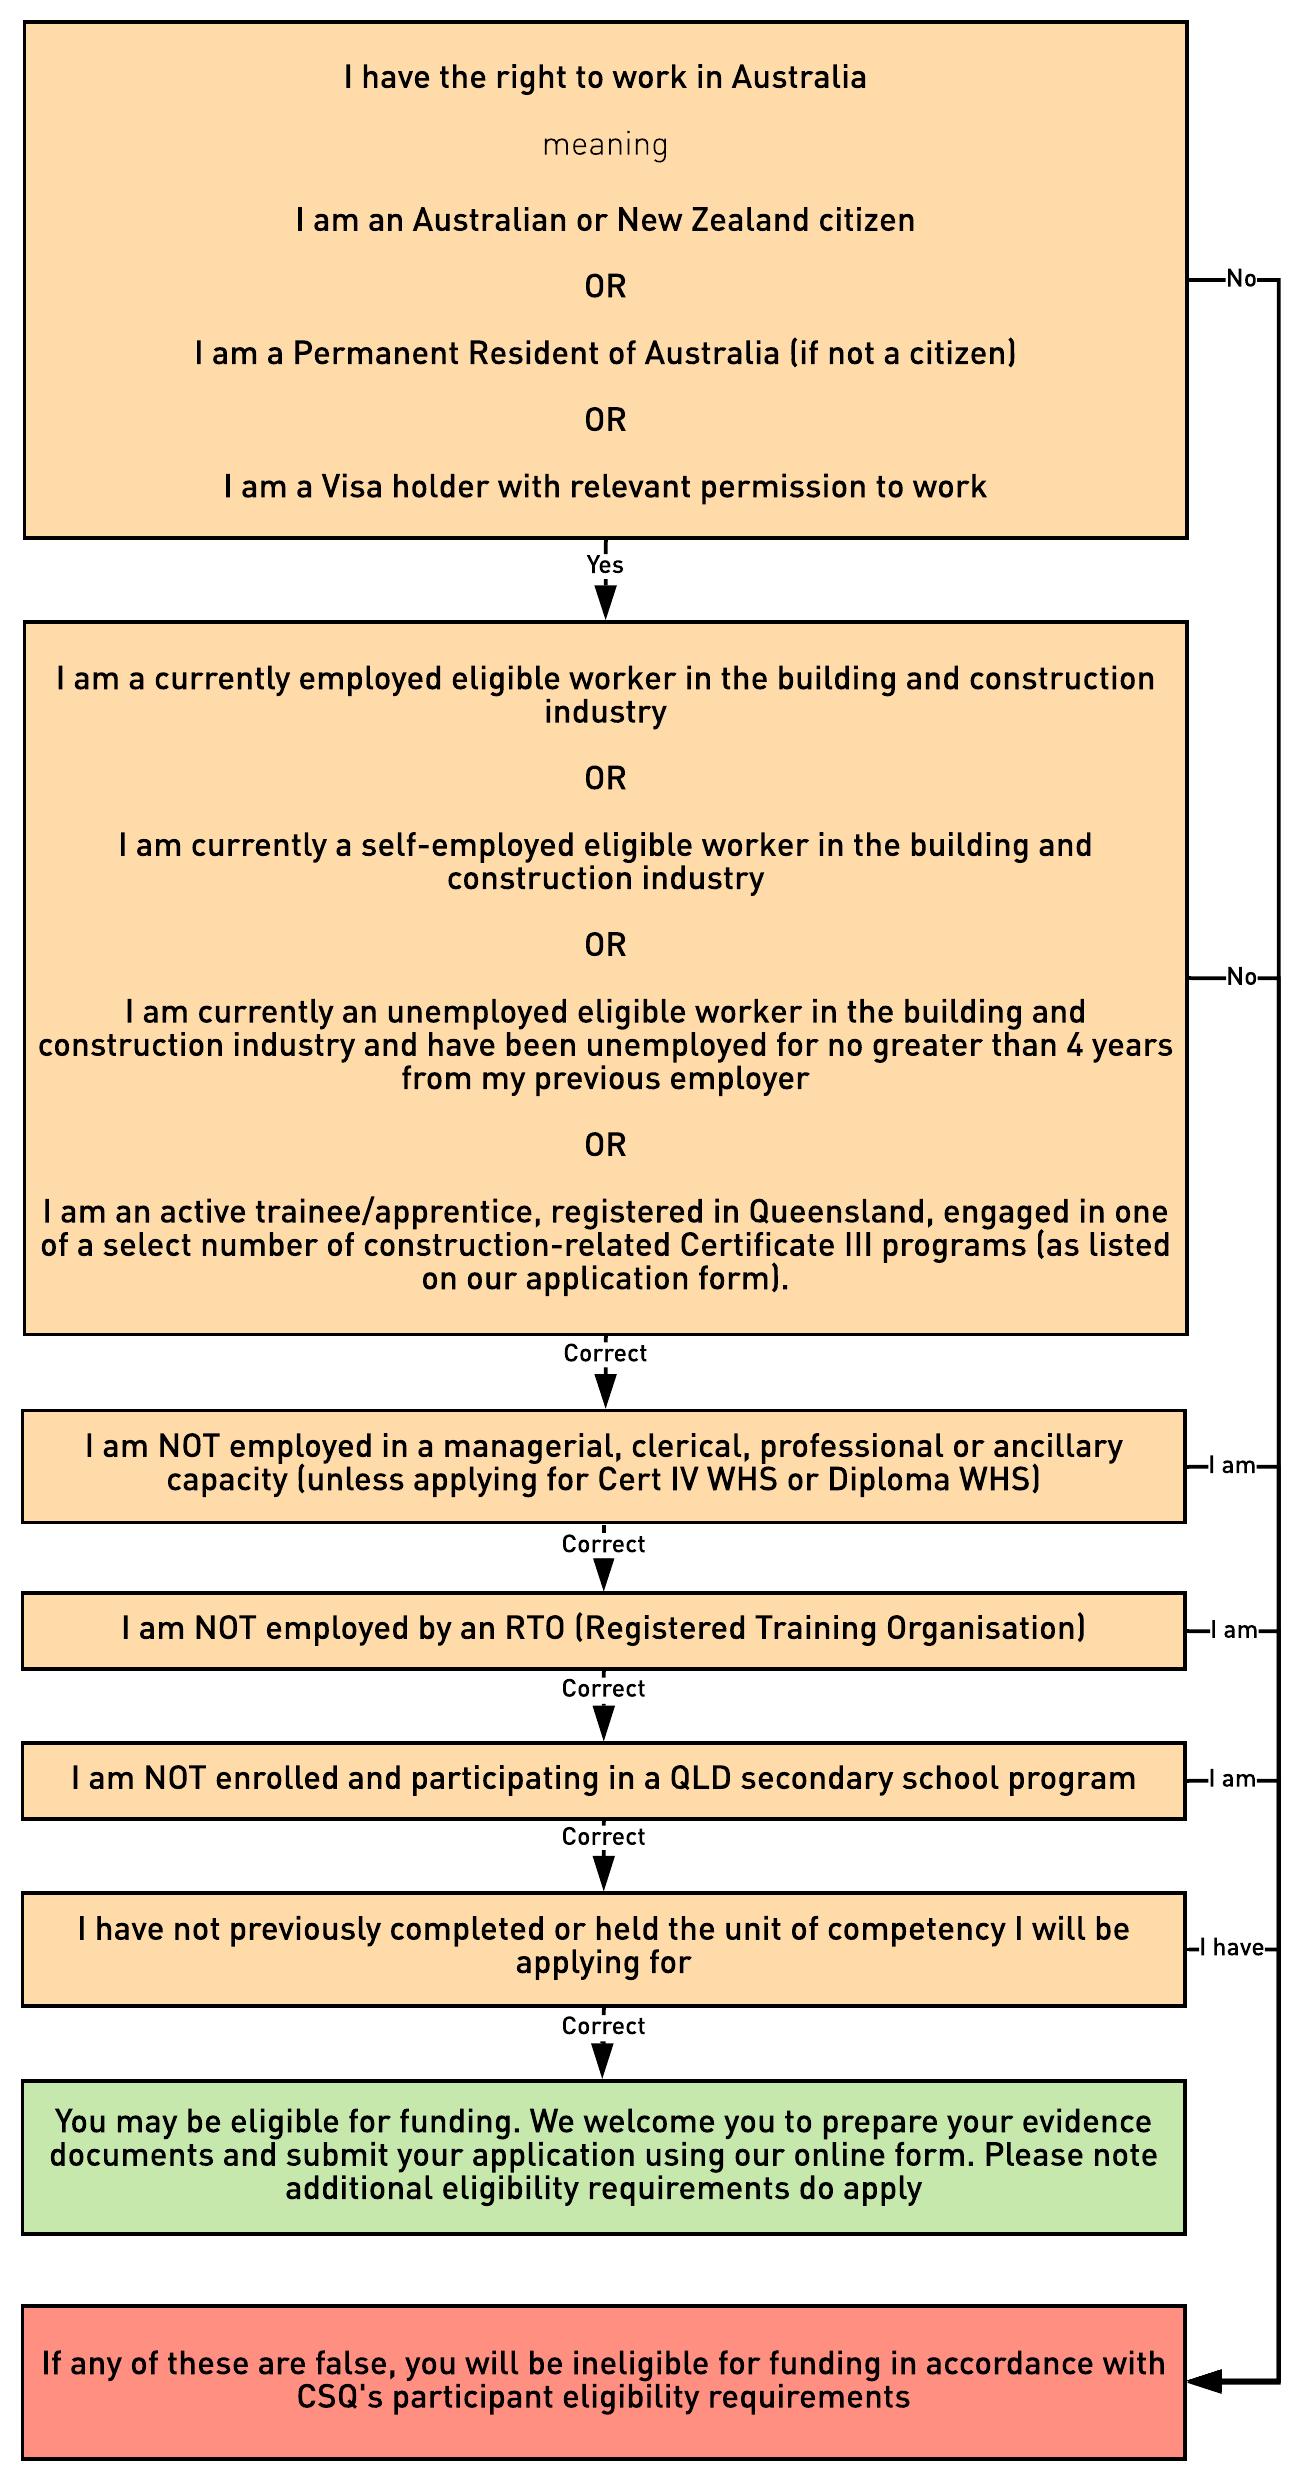 Self-screen eligibility flowchart